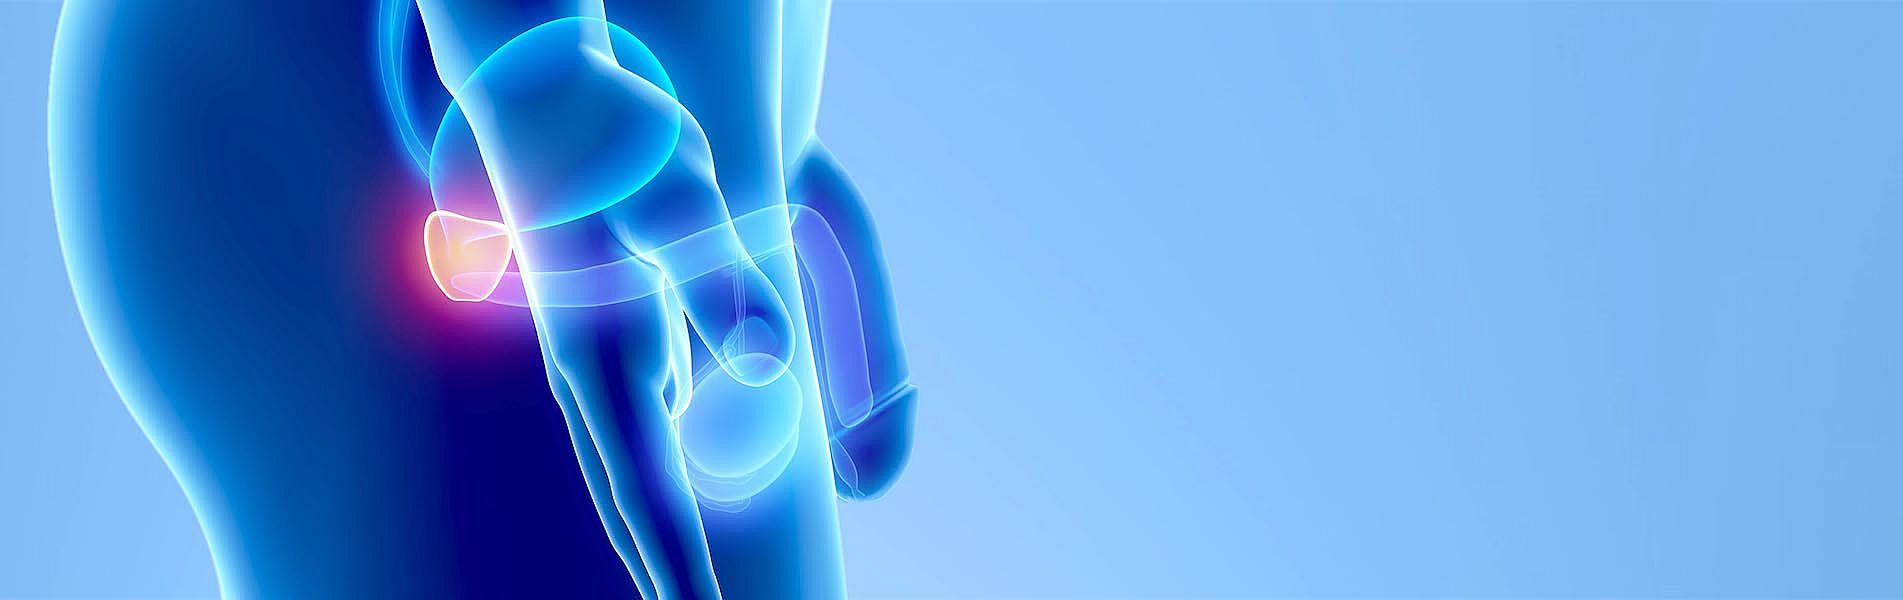 prostatakarzinom ursache